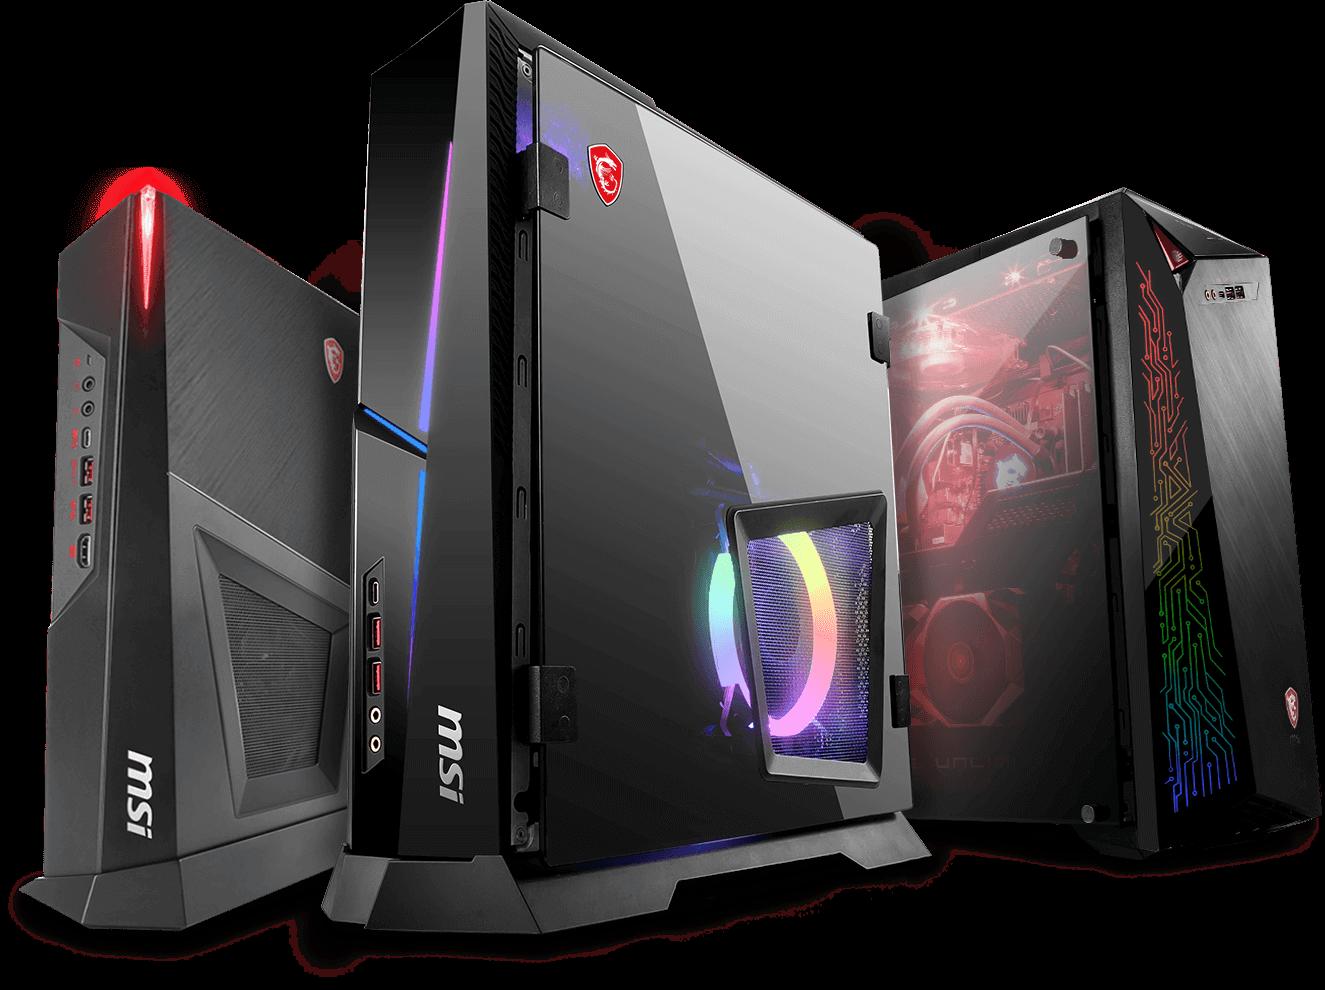 Best Gaming Desktop 2021 The Best Gaming Desktop 2020 | Gaming PC | MSI